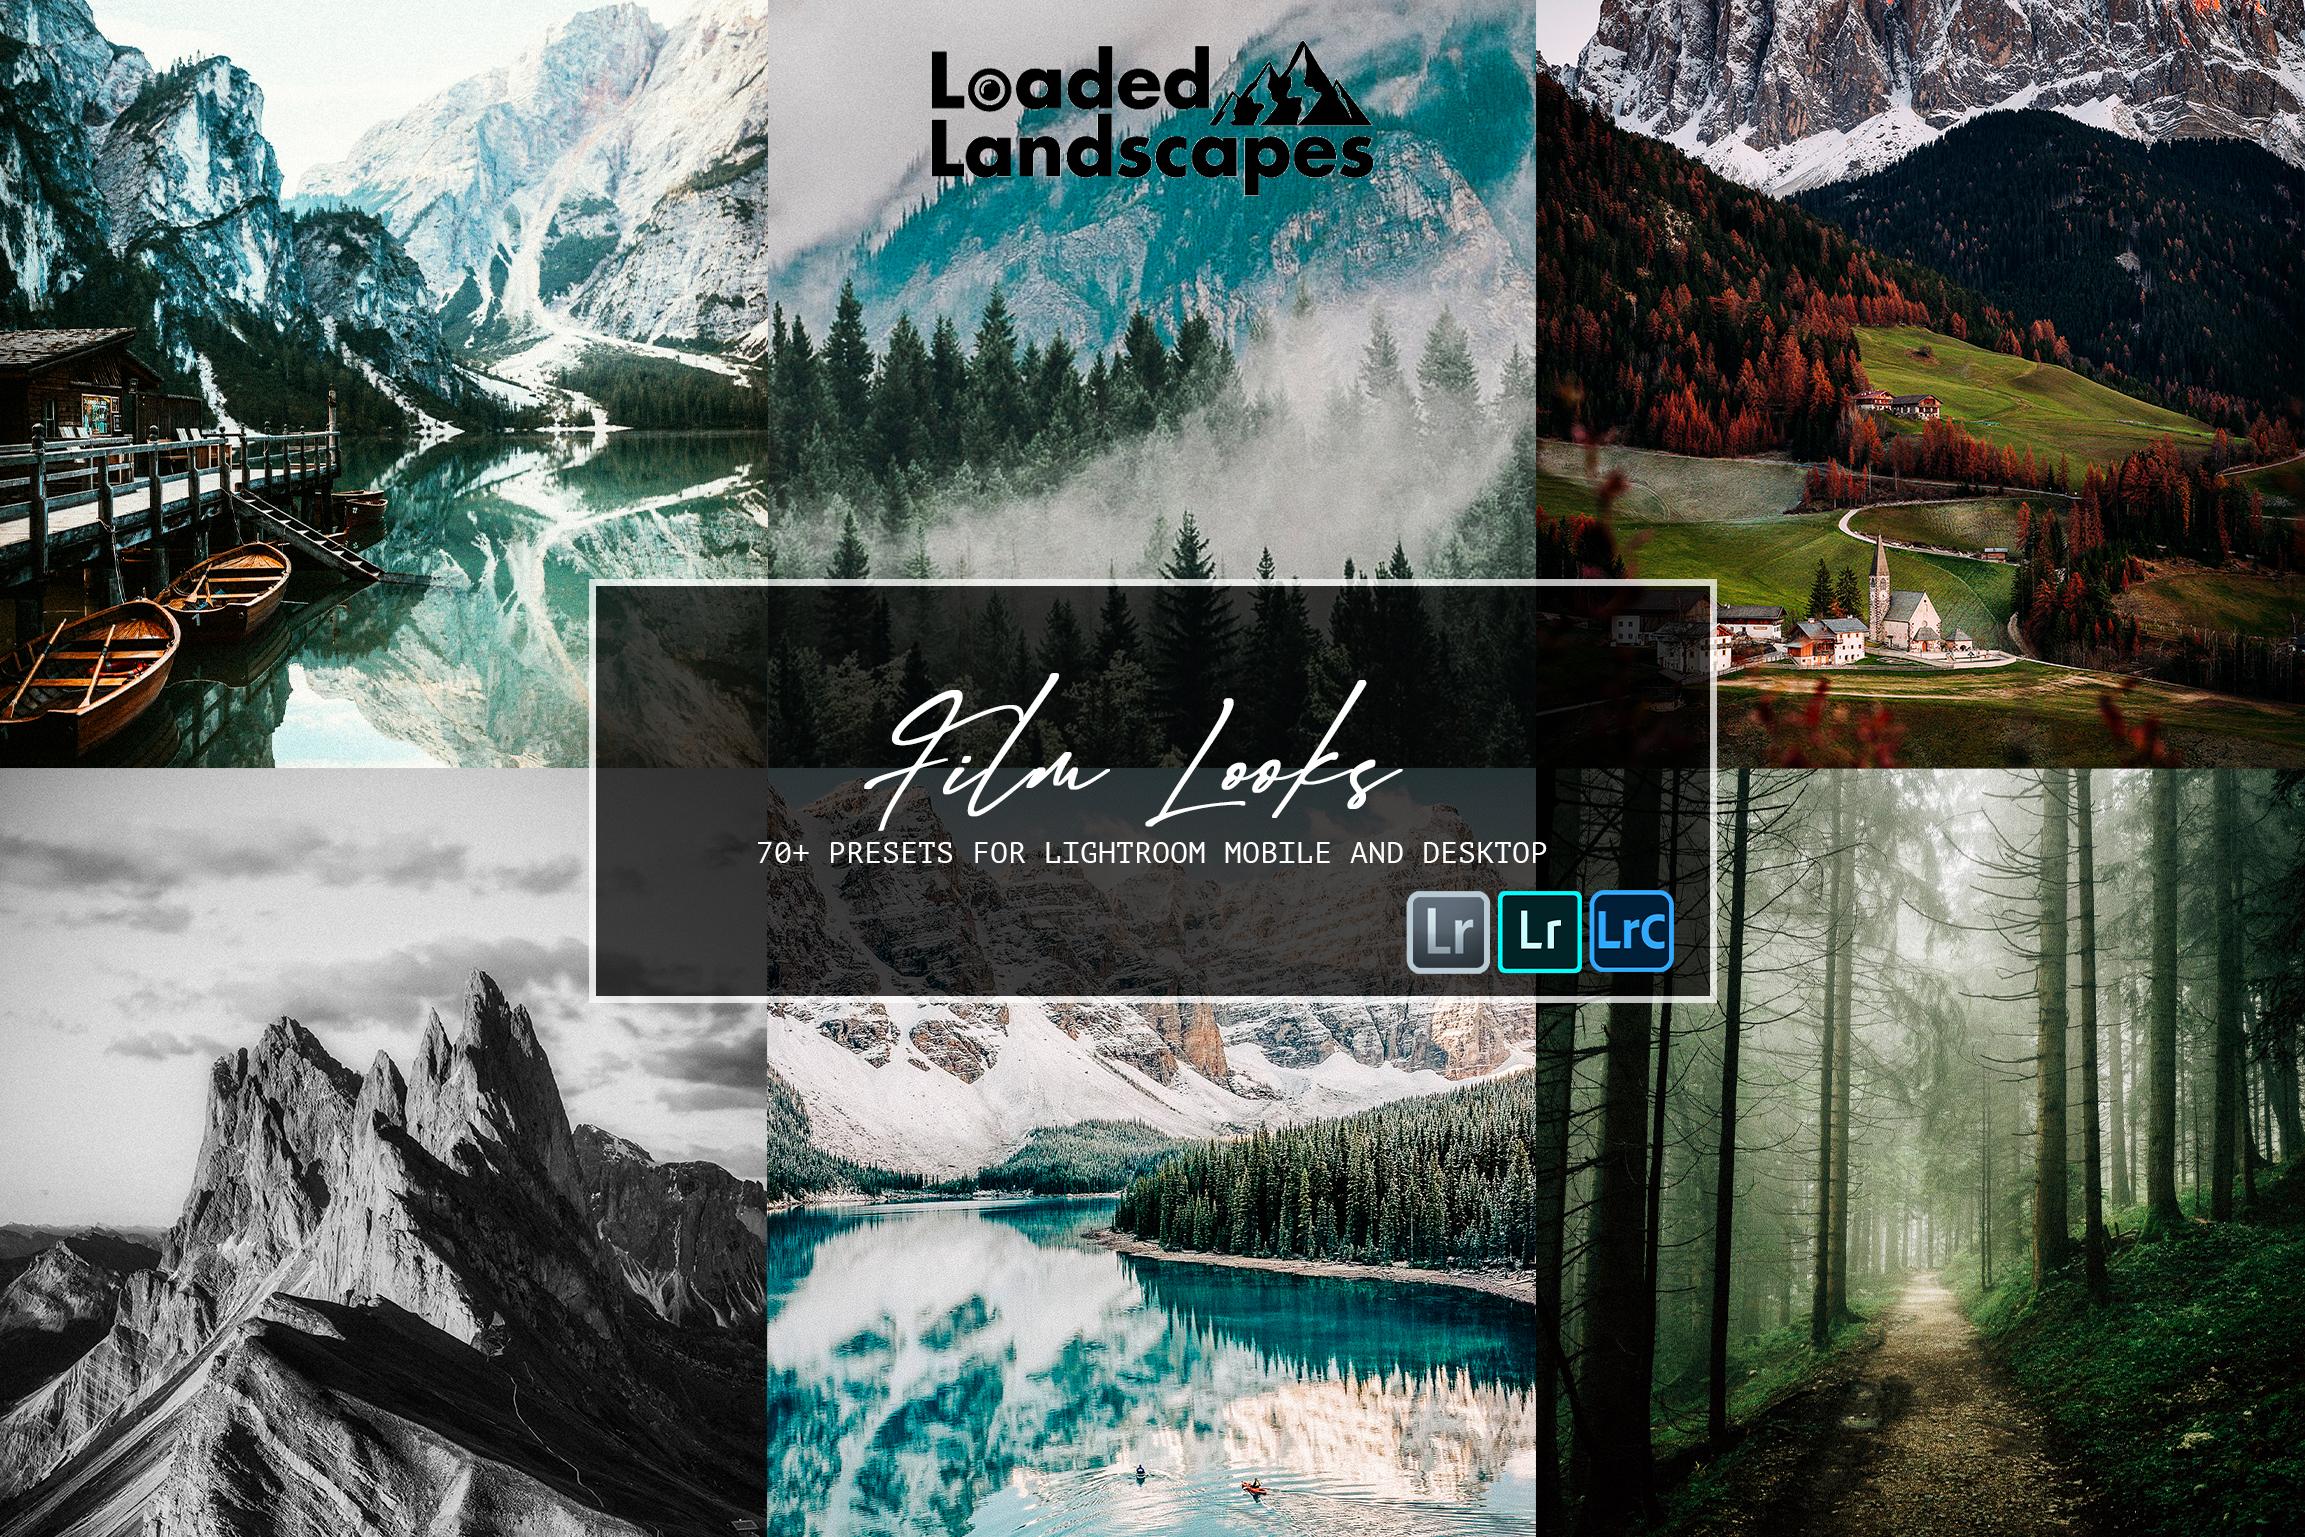 Film Presets for landscape photography, travel photography film presets, nature photography